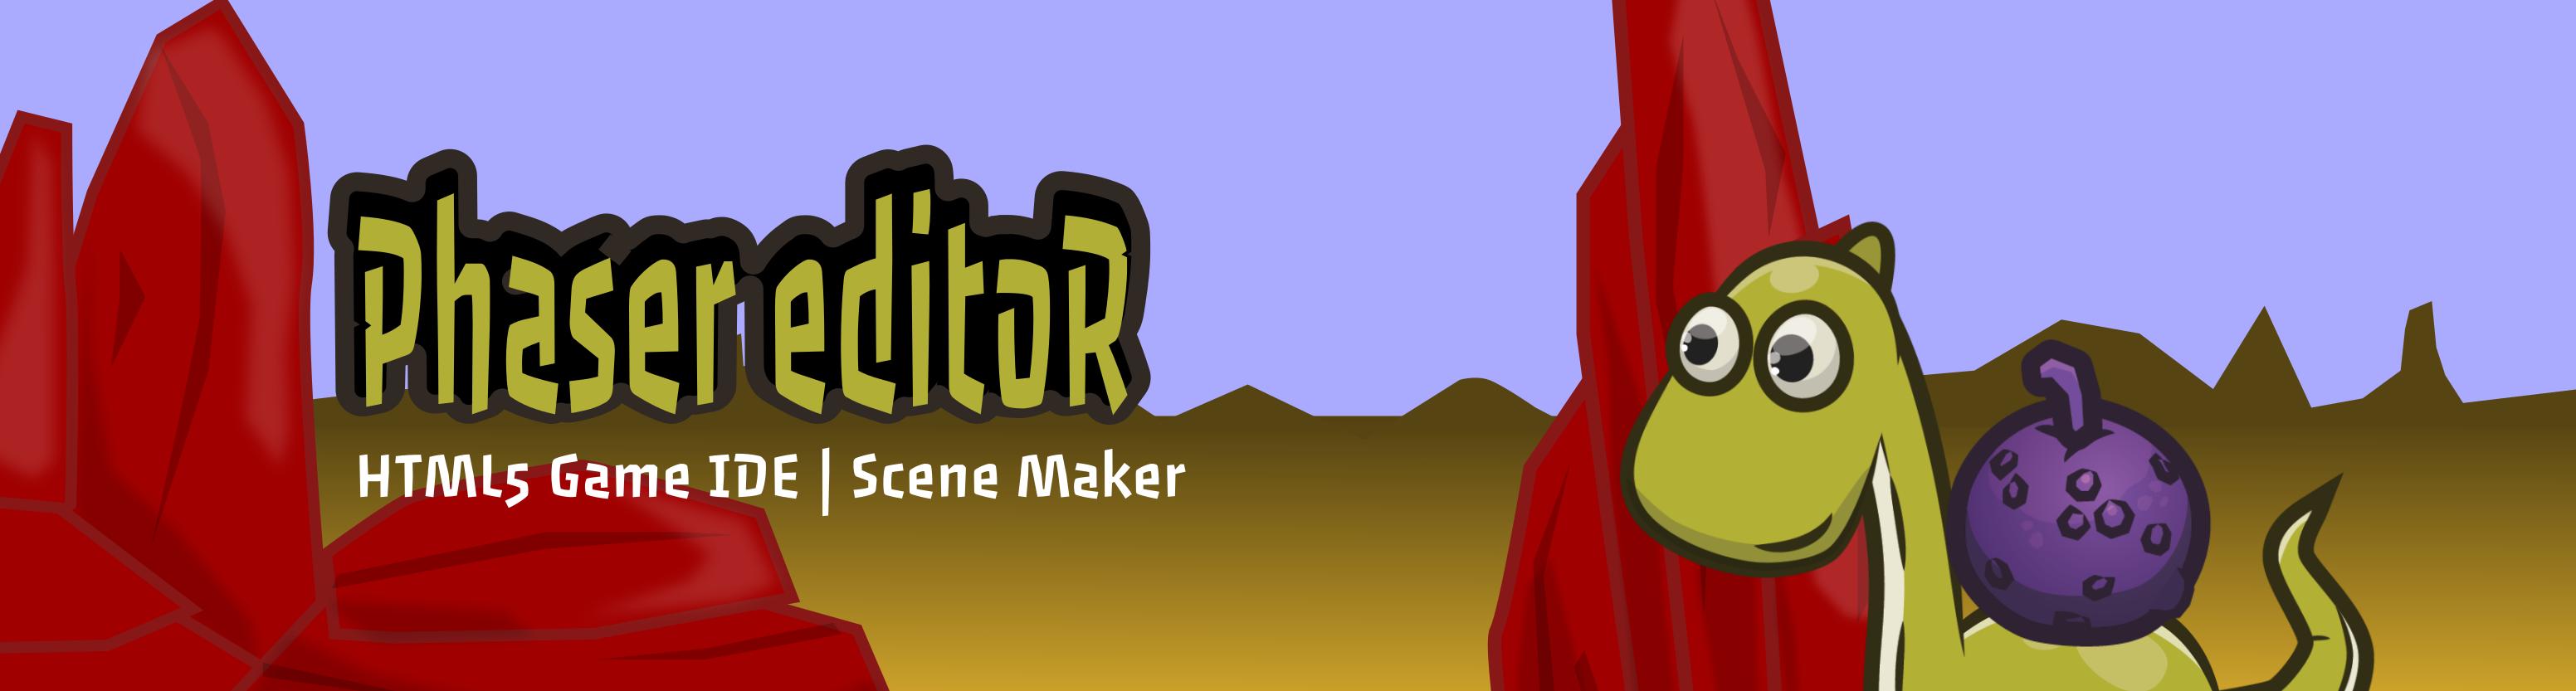 Phaser Editor 2D